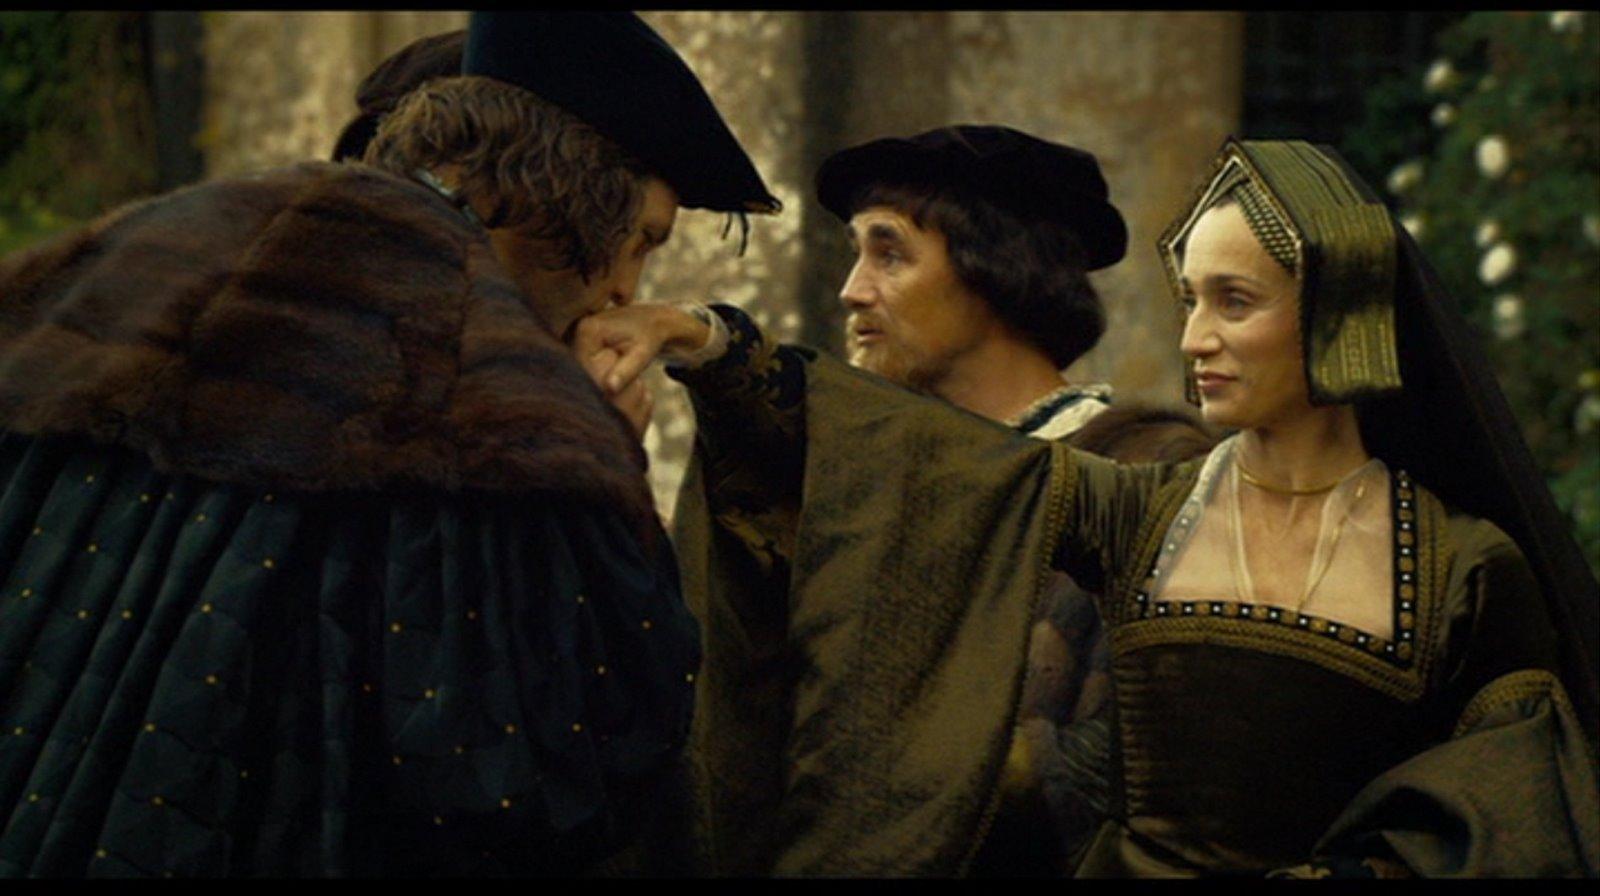 The Other Boleyn Girl Hd Wallpaper Kristin Scott Thomas Images The Other Boleyn Girl Hd